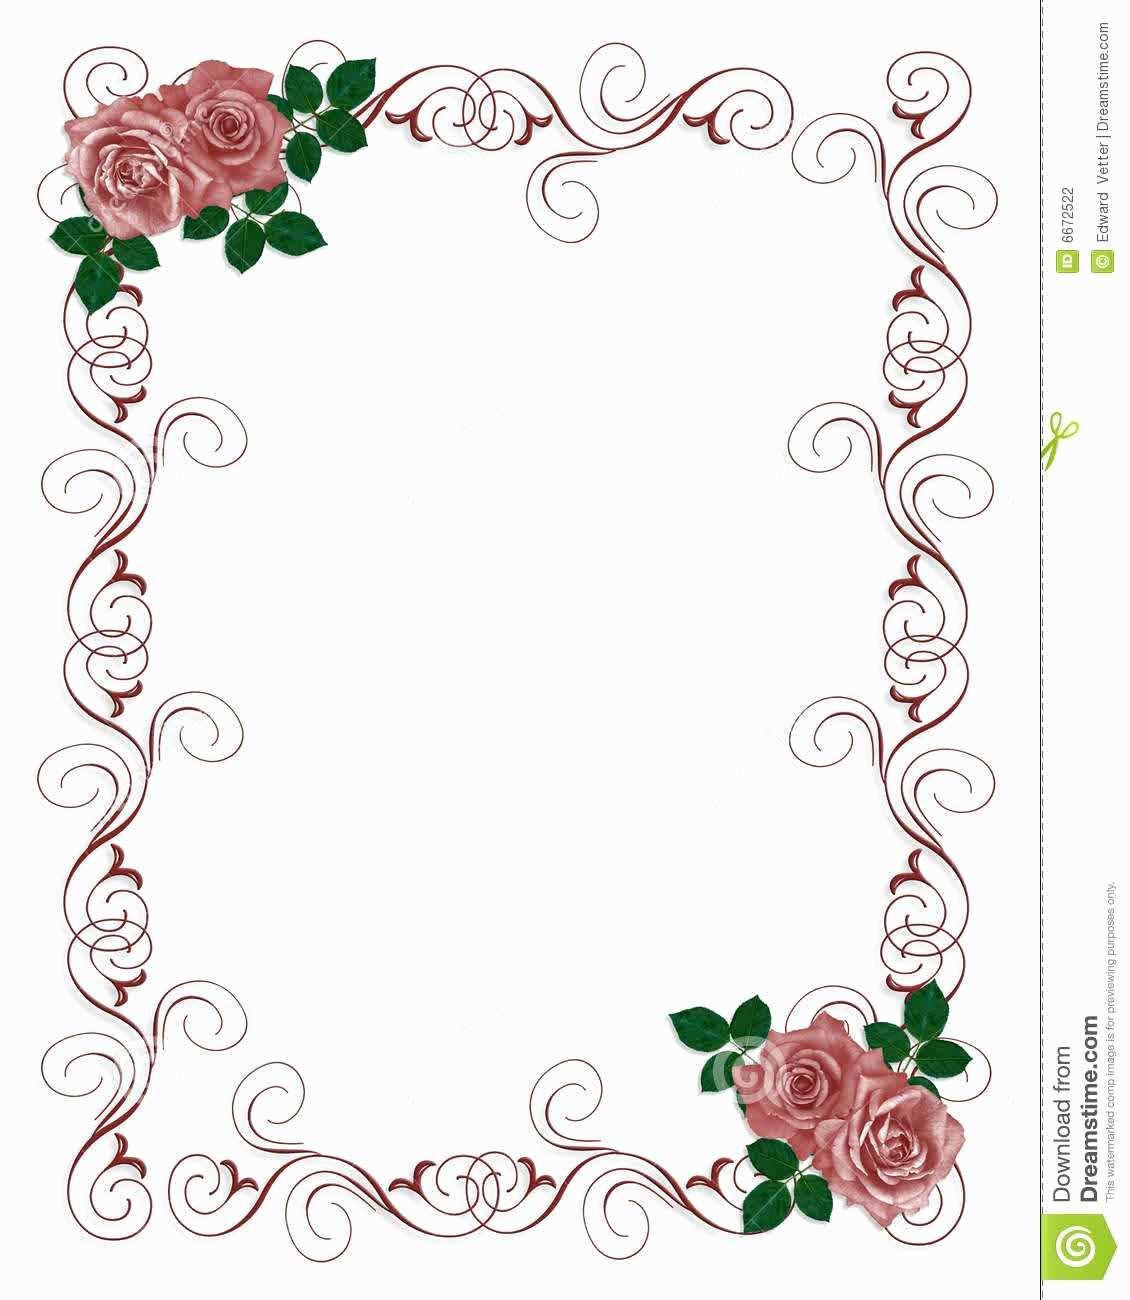 15 Standard Floral Blank Invitation Template PSD File for Floral Blank Invitation  Template - Cards Design Templates